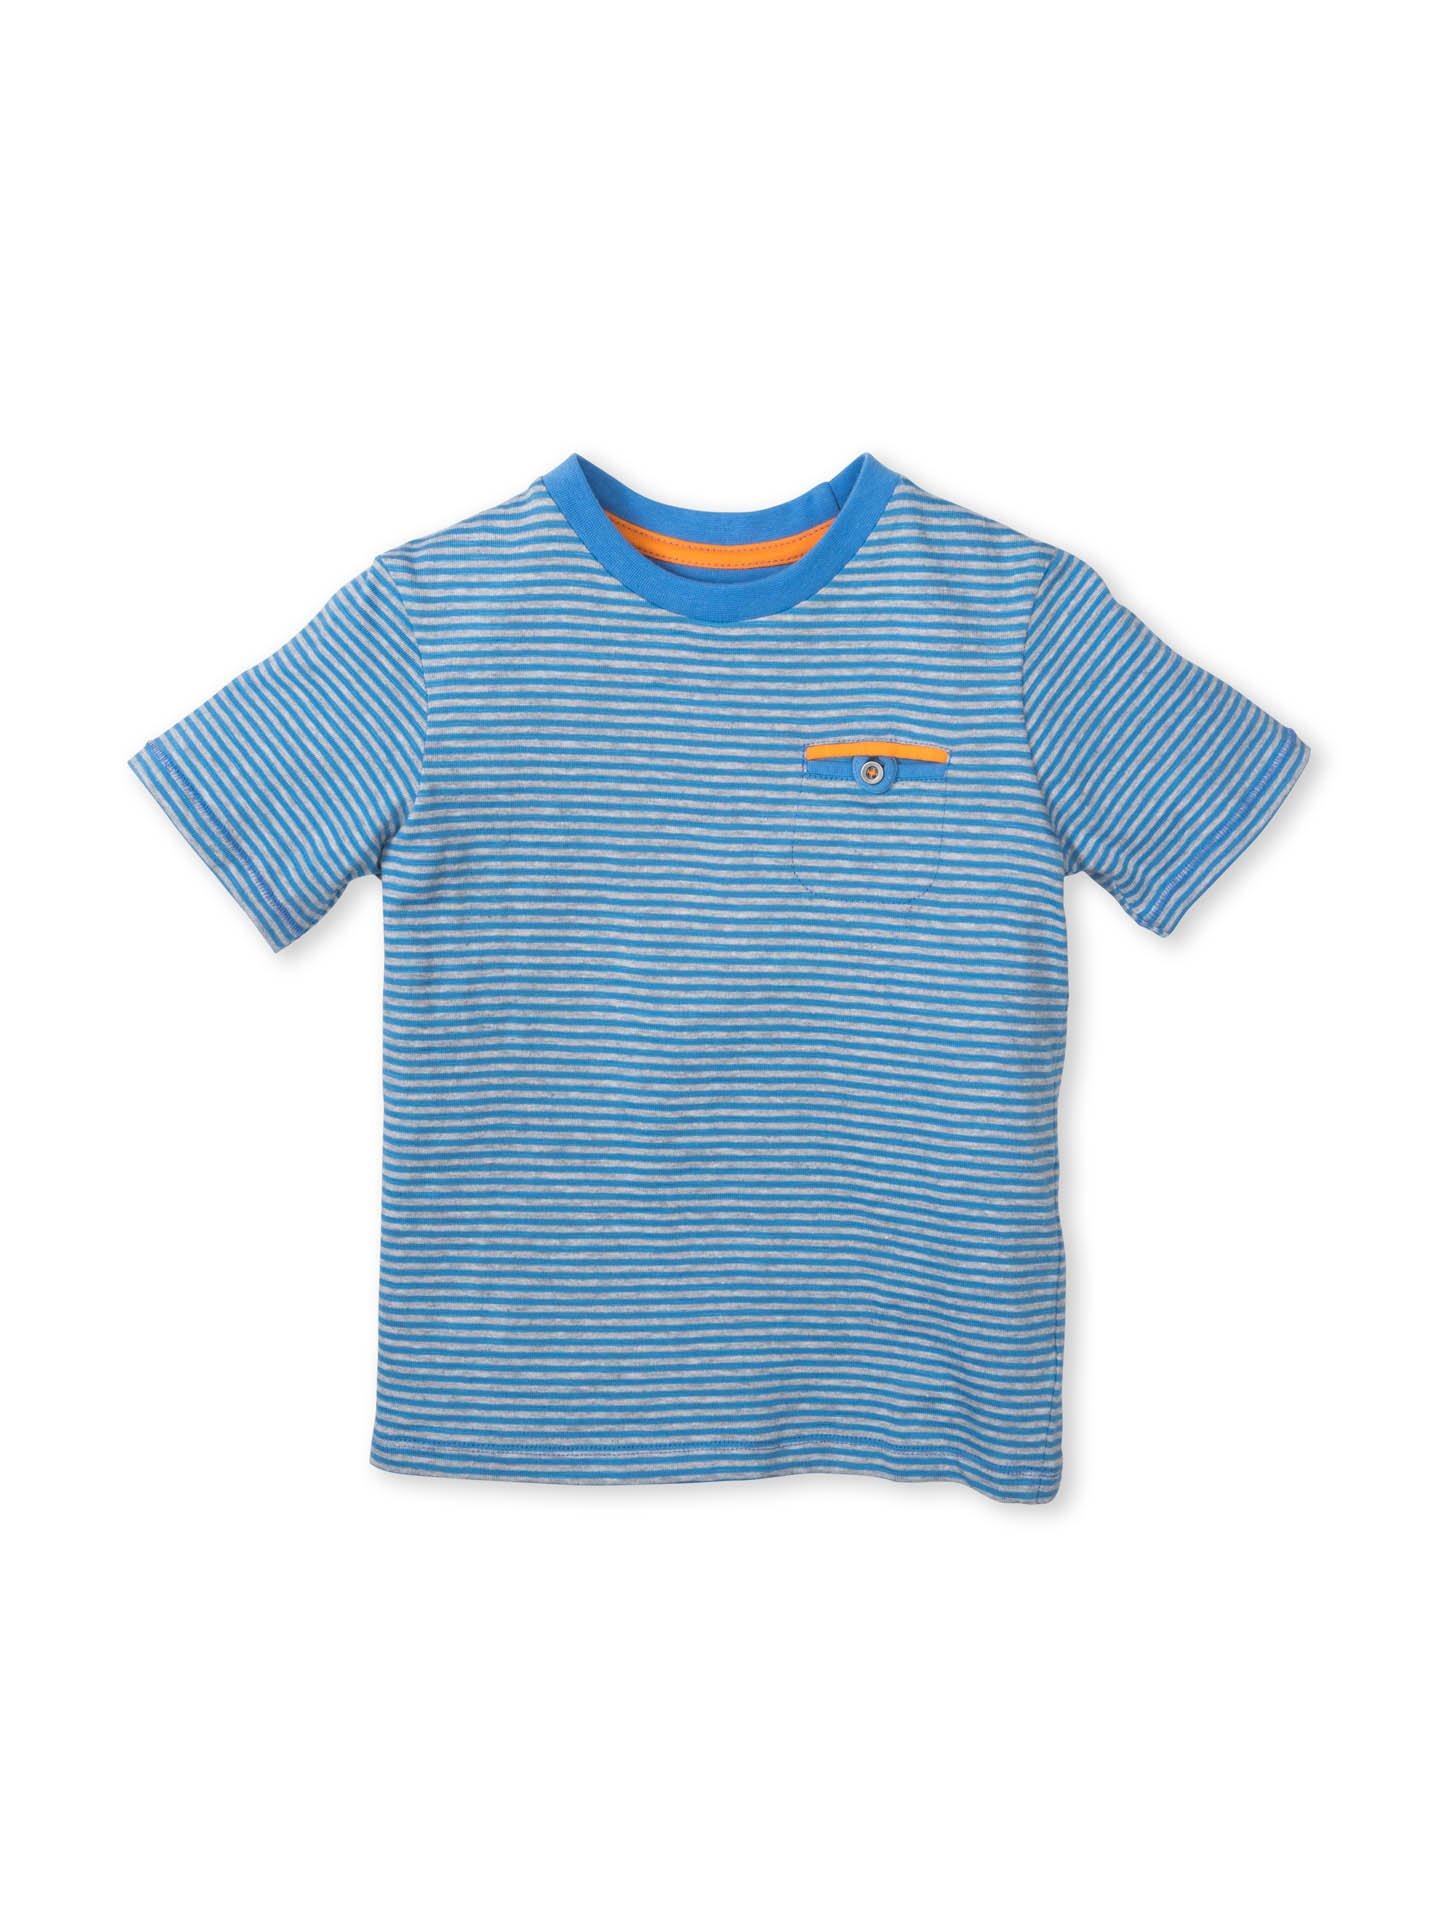 Colored Organics Boys Organic Crew Tee Shirt - Blue Stripe - 5T